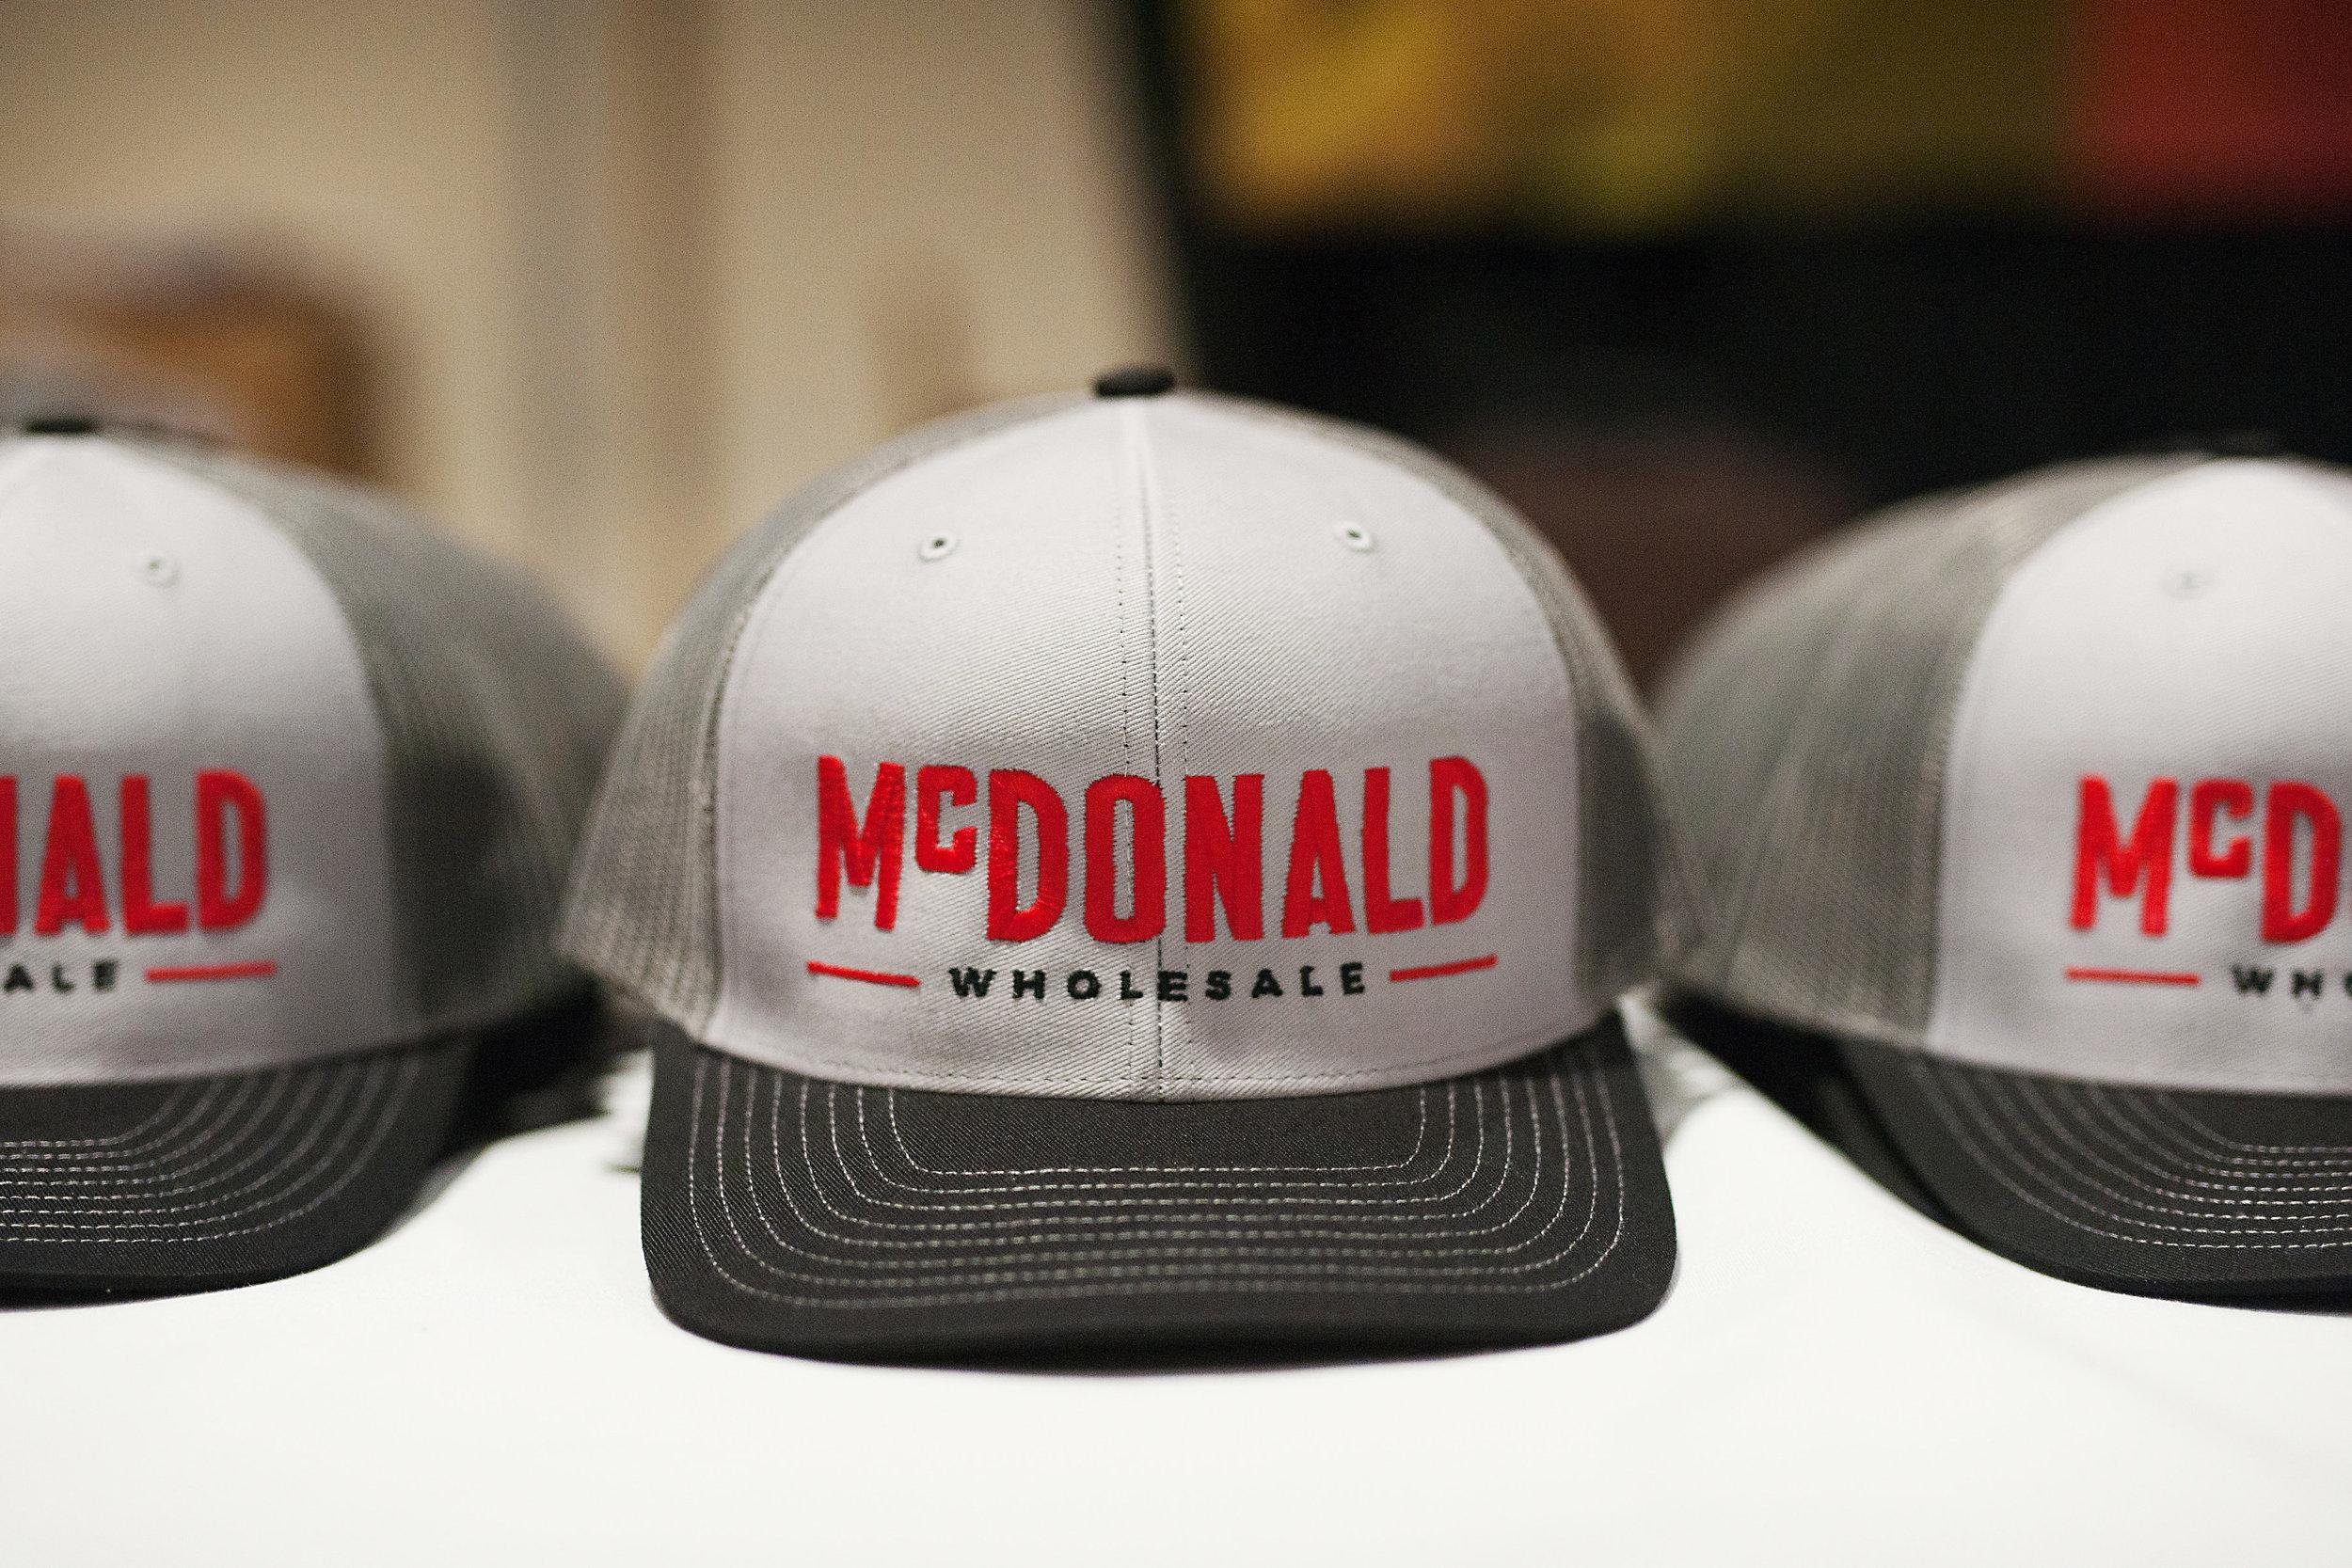 McDonald_2018_007.jpg